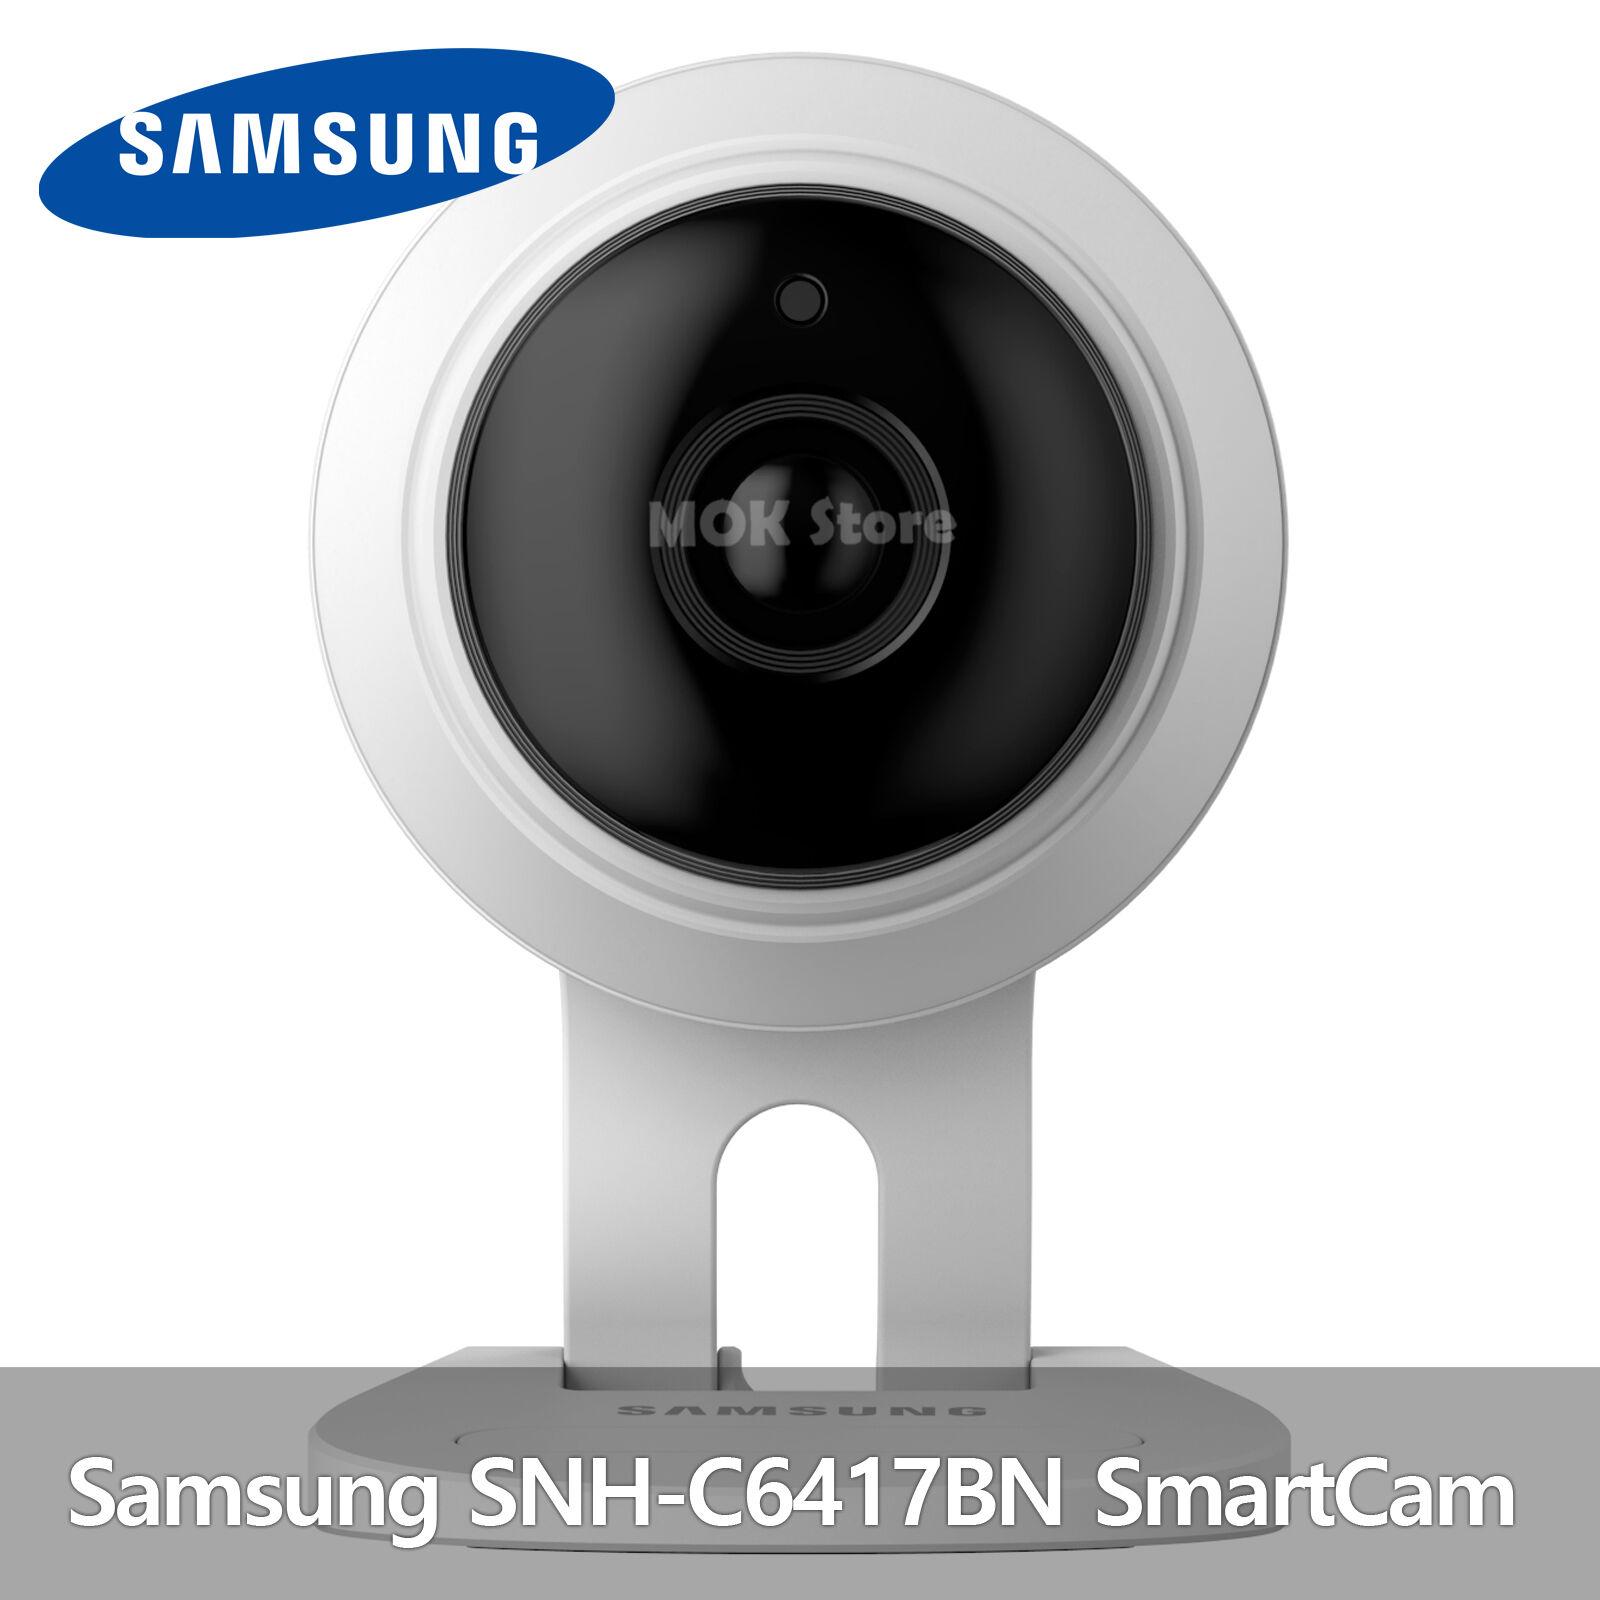 Details about Samsung Wisenet SNH-C6417BN Monitoring CCTV Full HD Wi-Fi IP  Camera 16GB